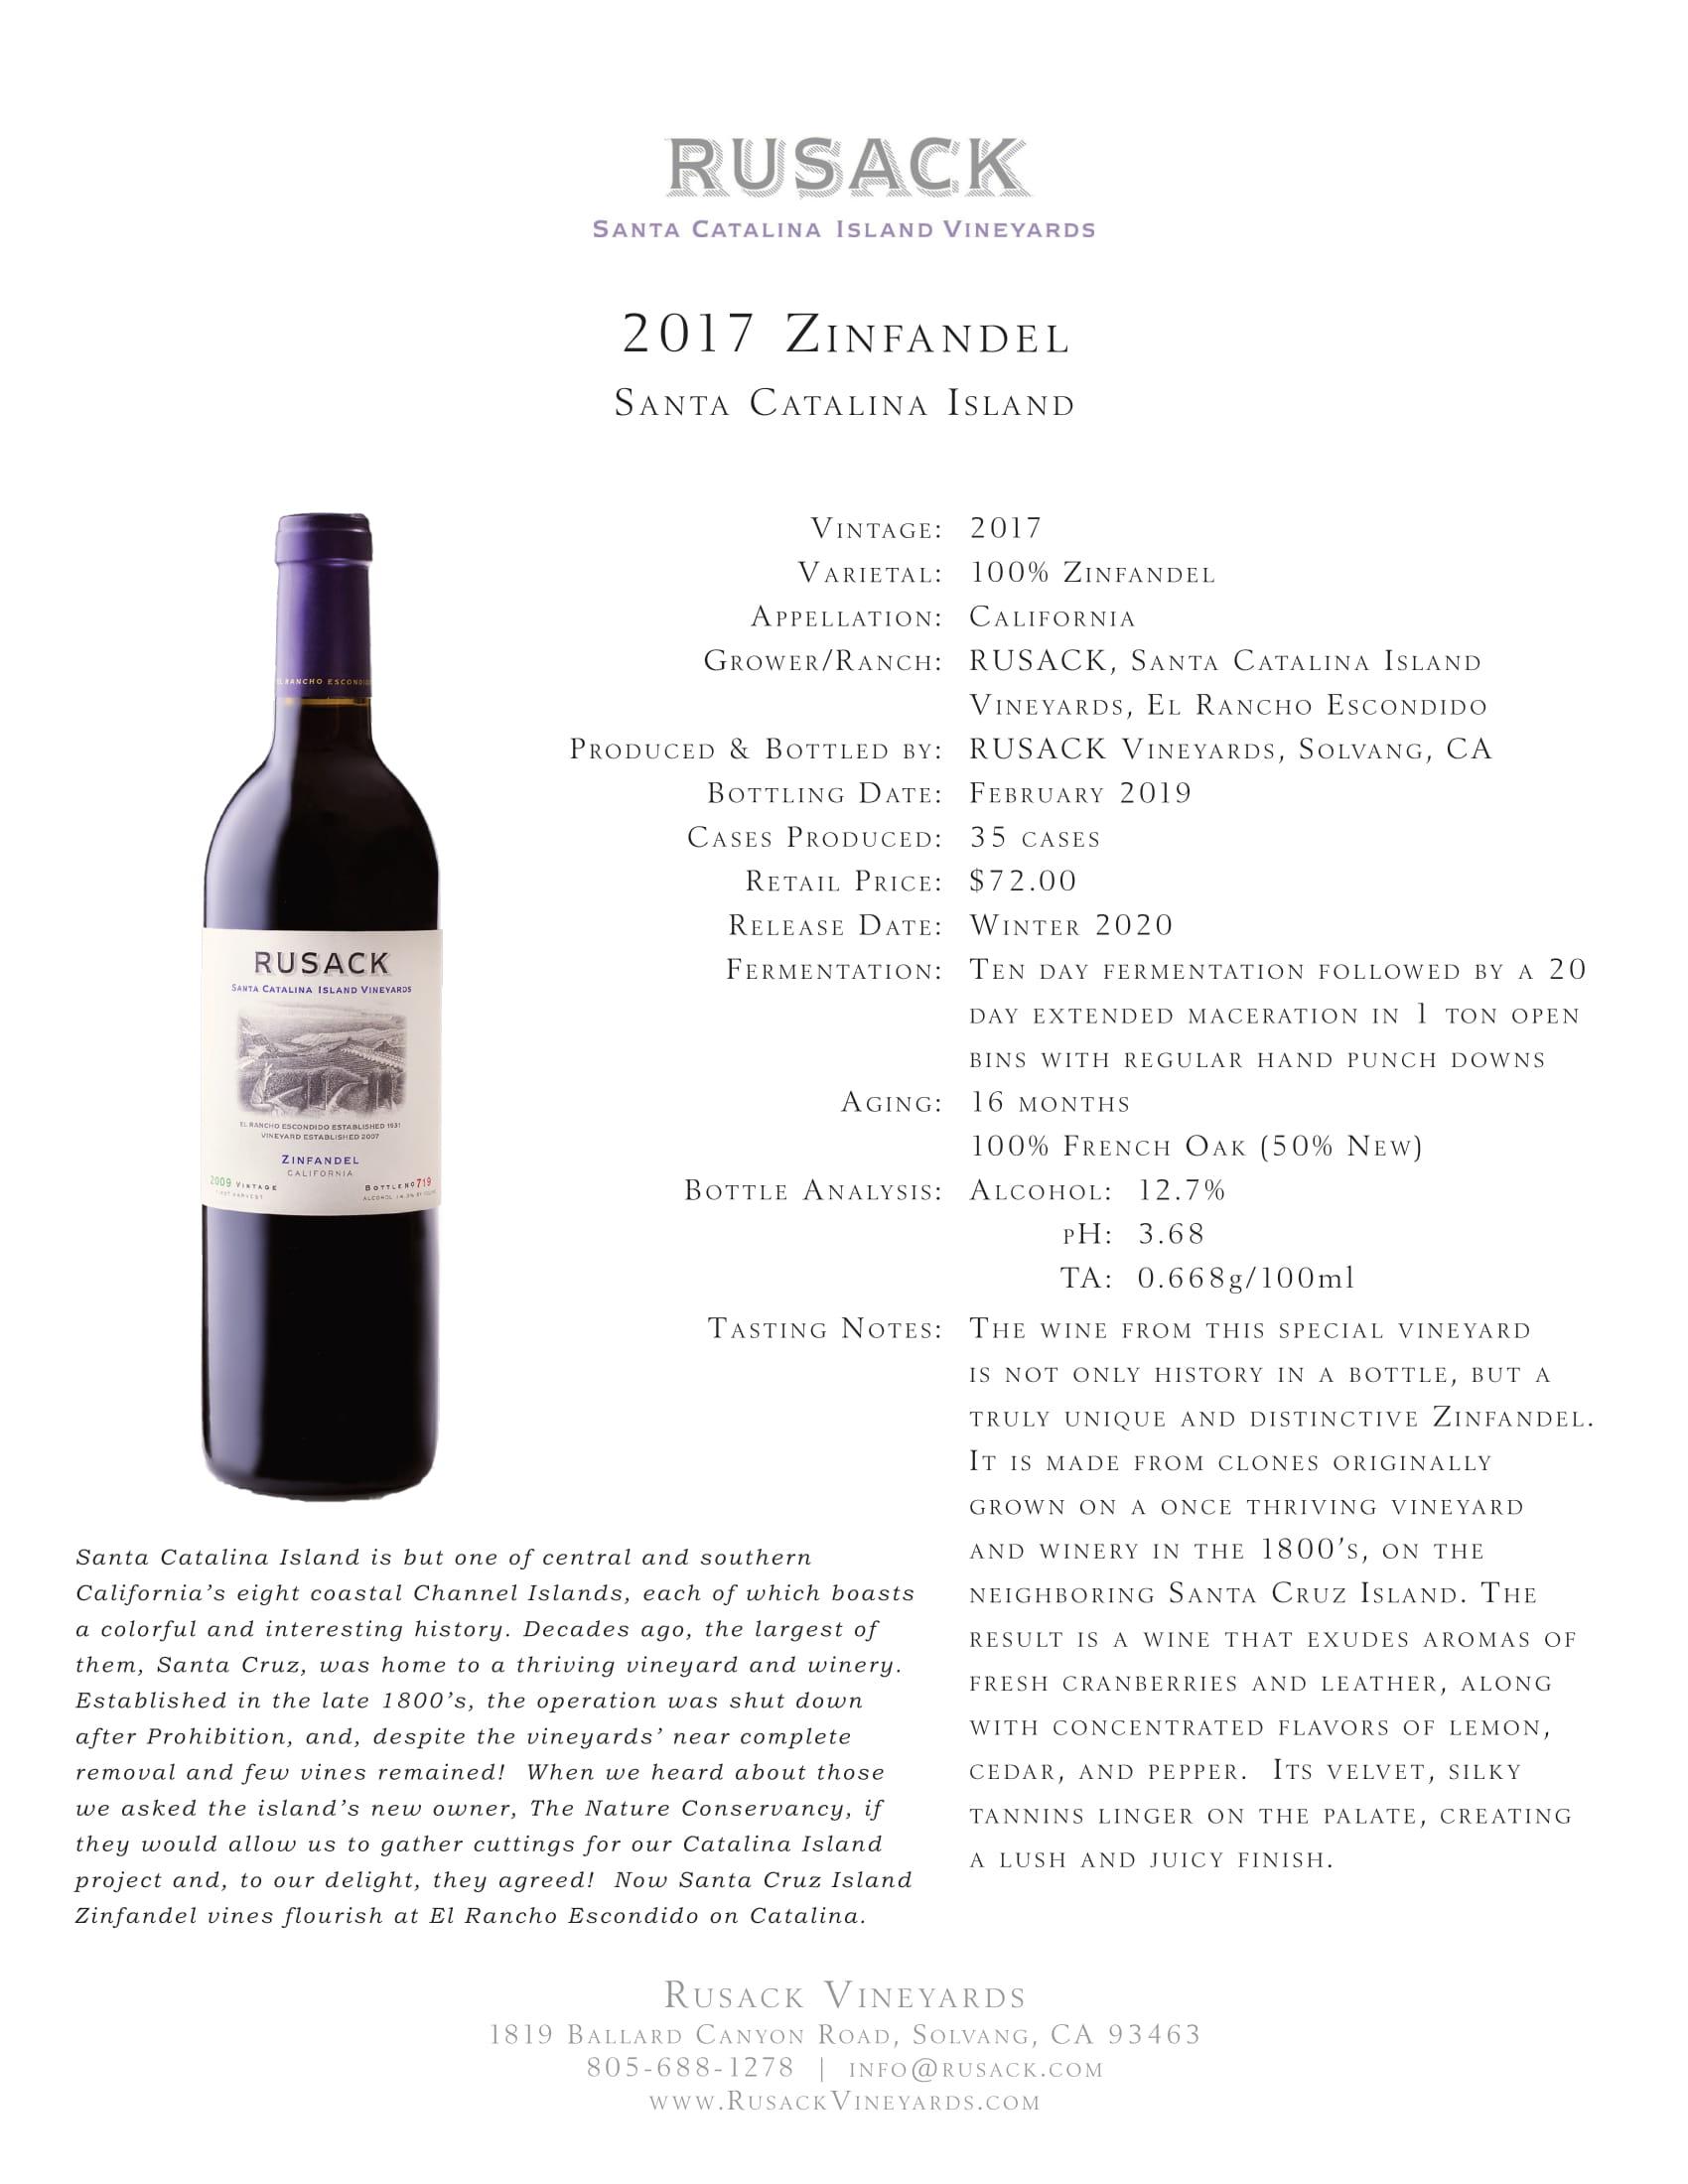 Rusack Vineyards Zinfandel Santa Catalina Island Sell Sheet